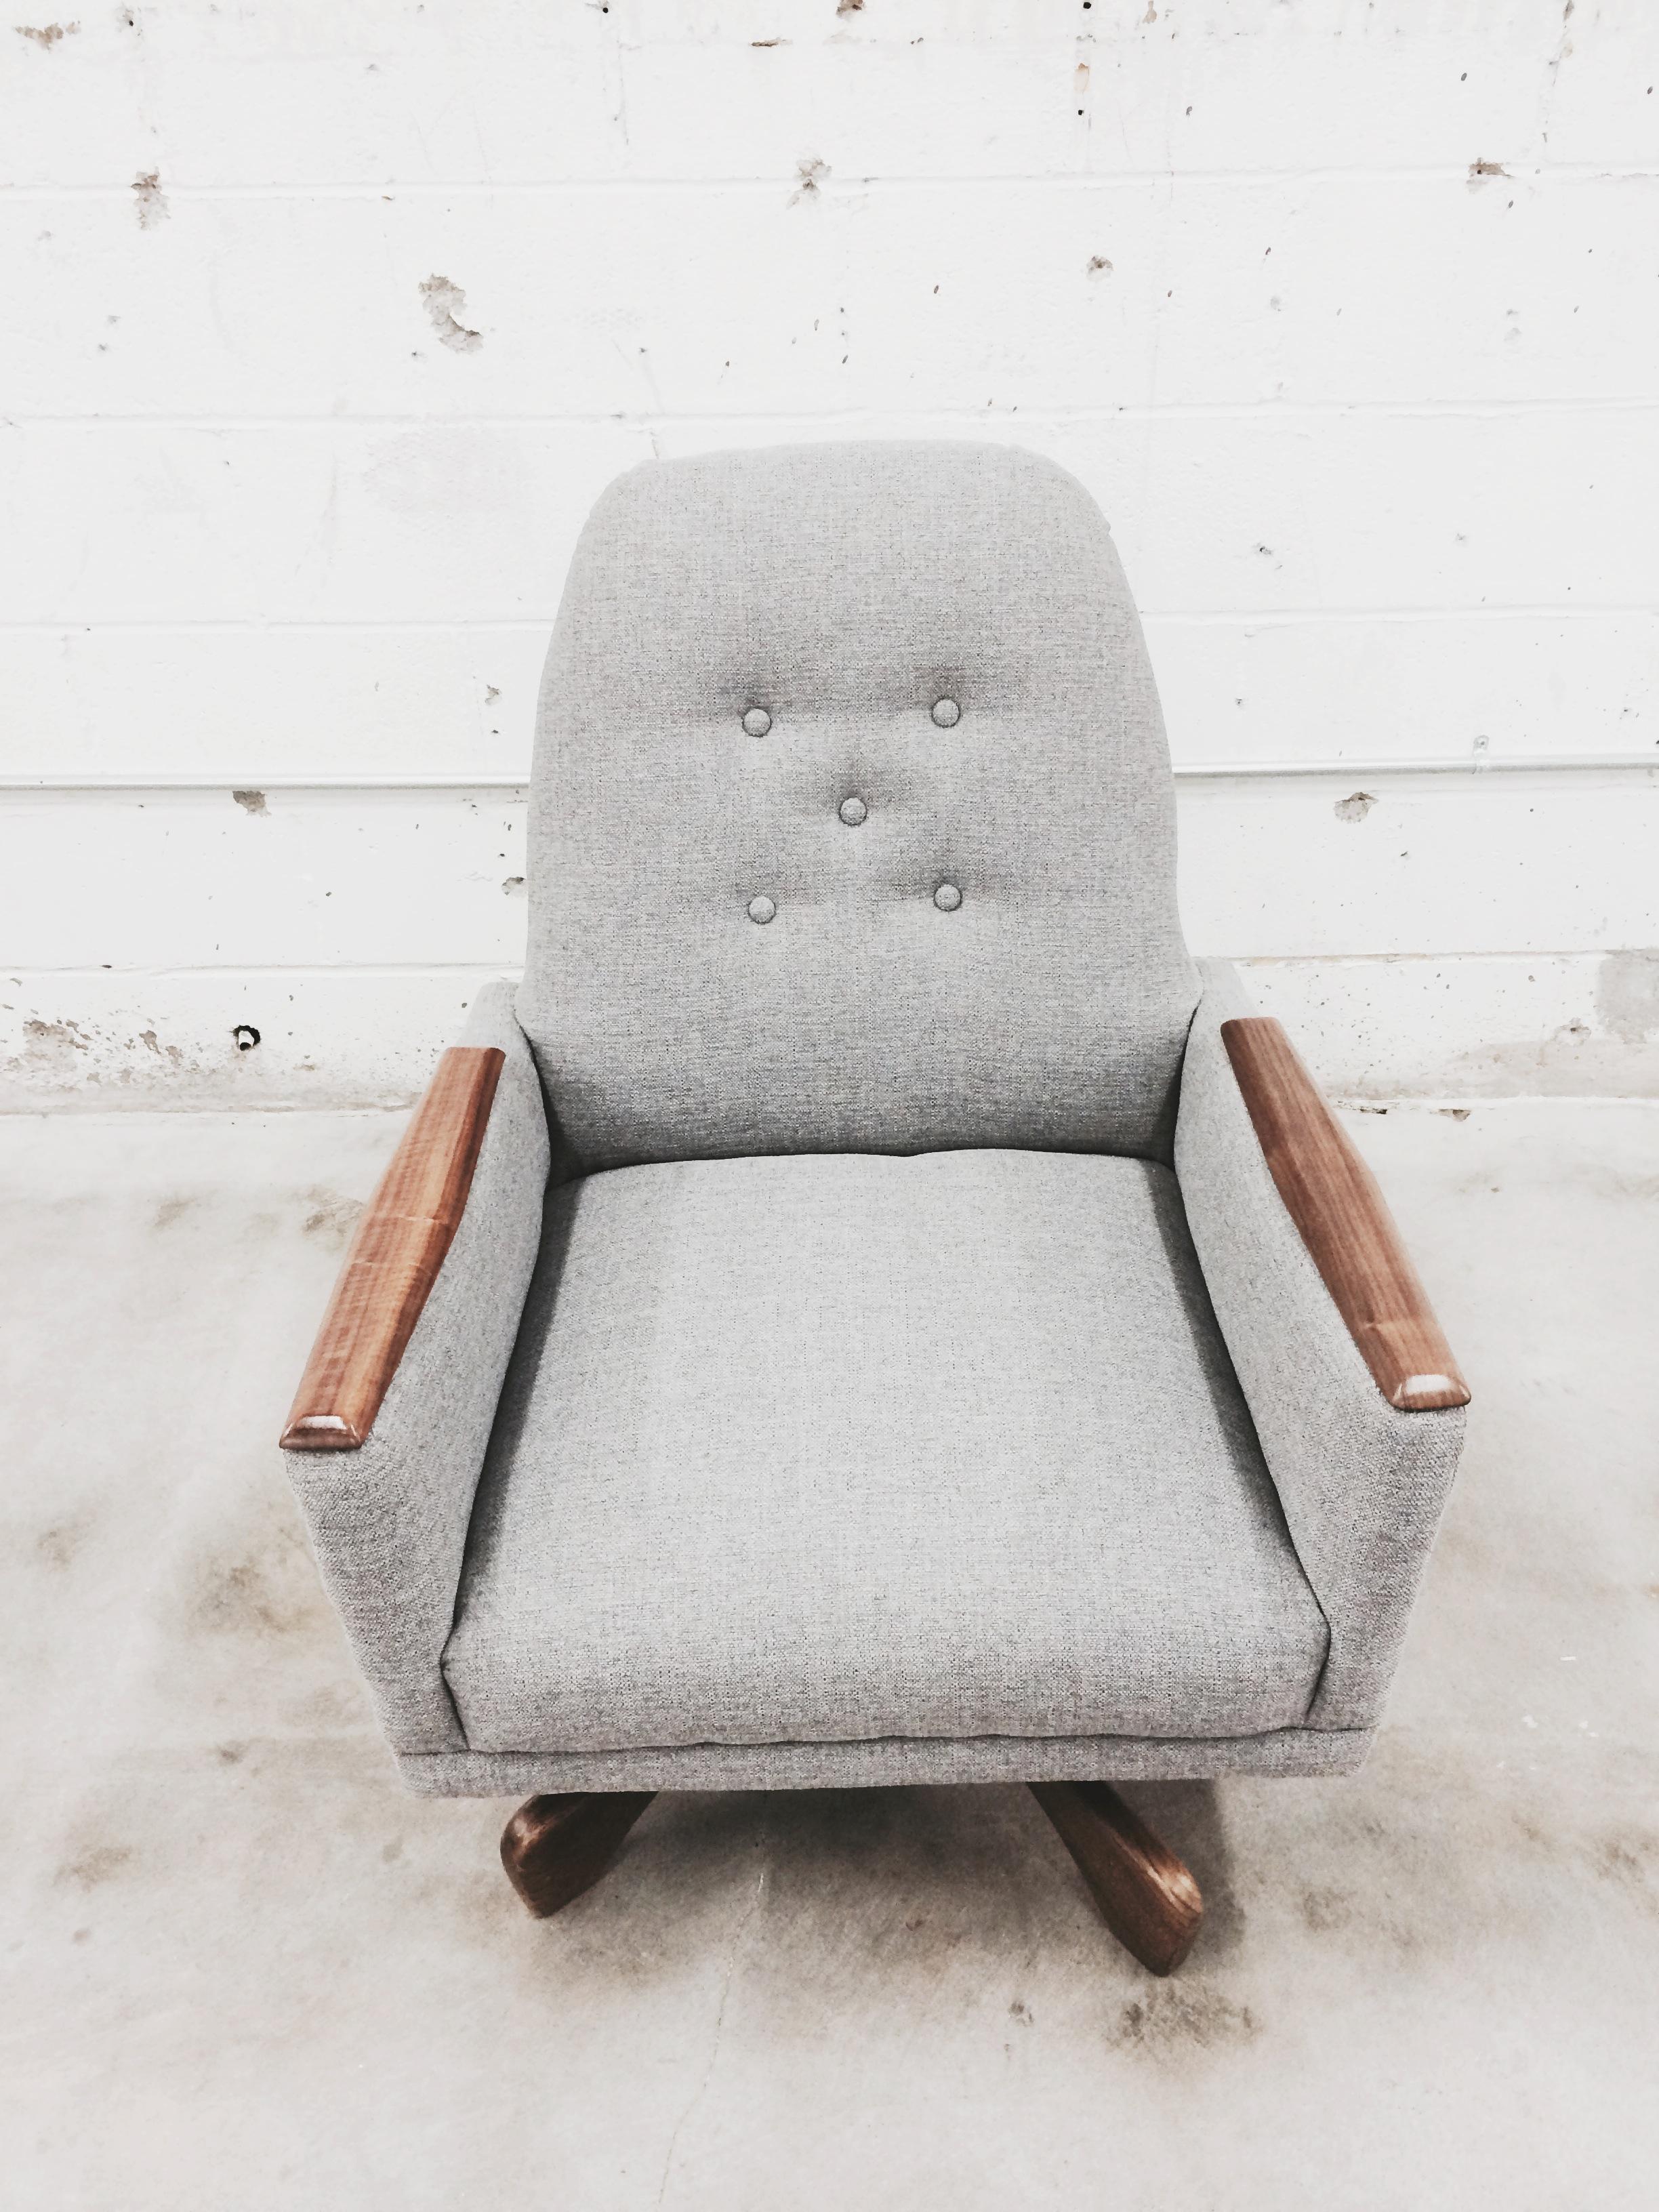 reupholsteredrockingchair